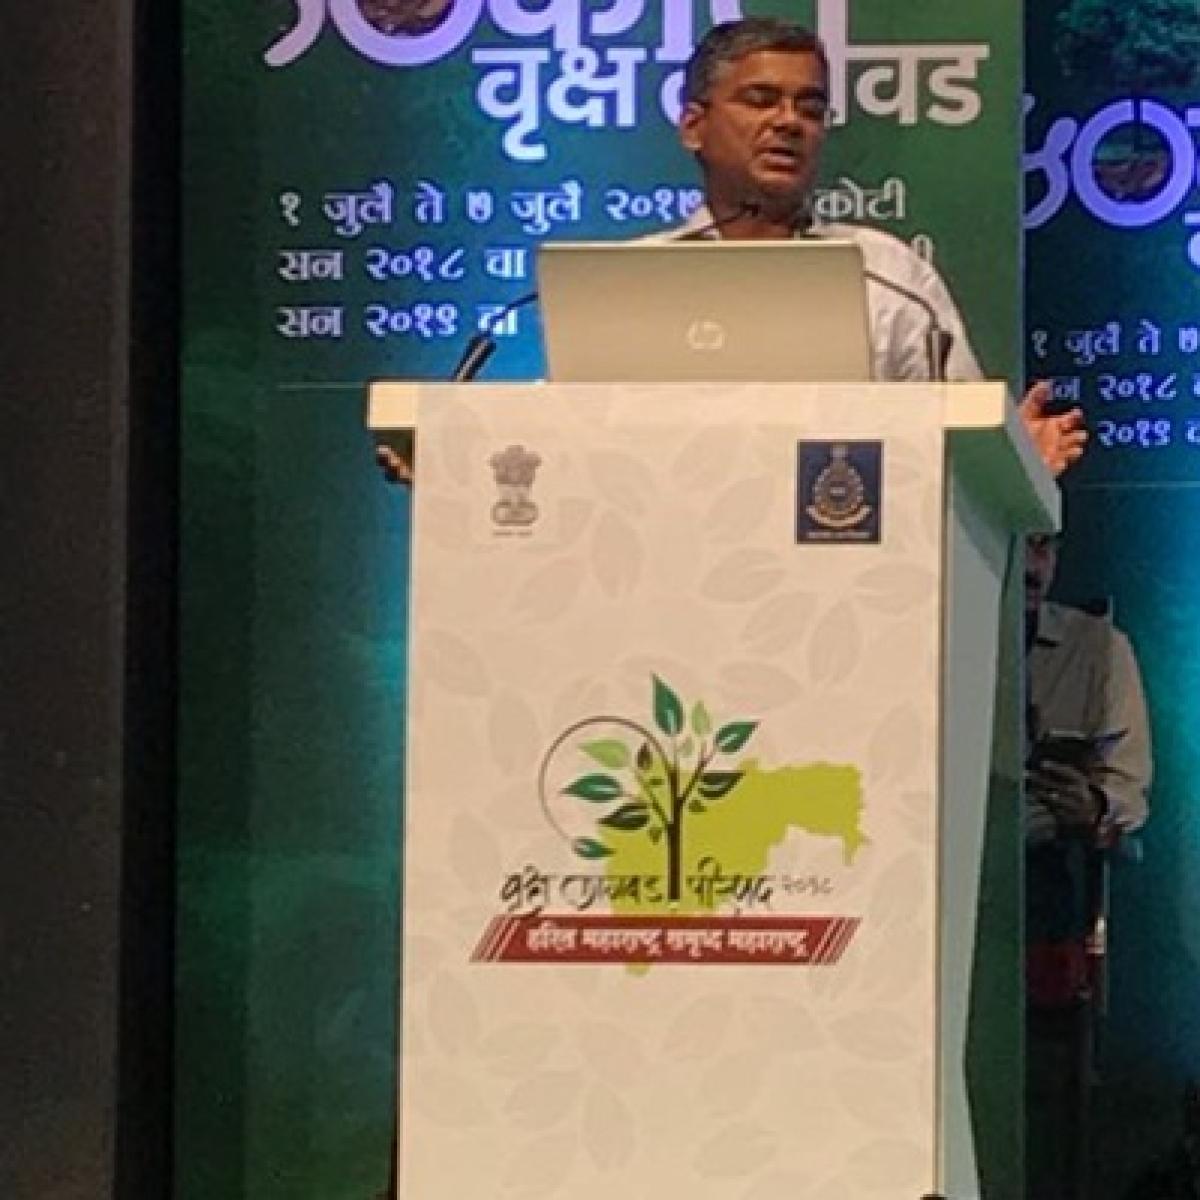 Bureaucratic reshuffle: Forest secretary Vikas Kharge post as principal secretary to CM